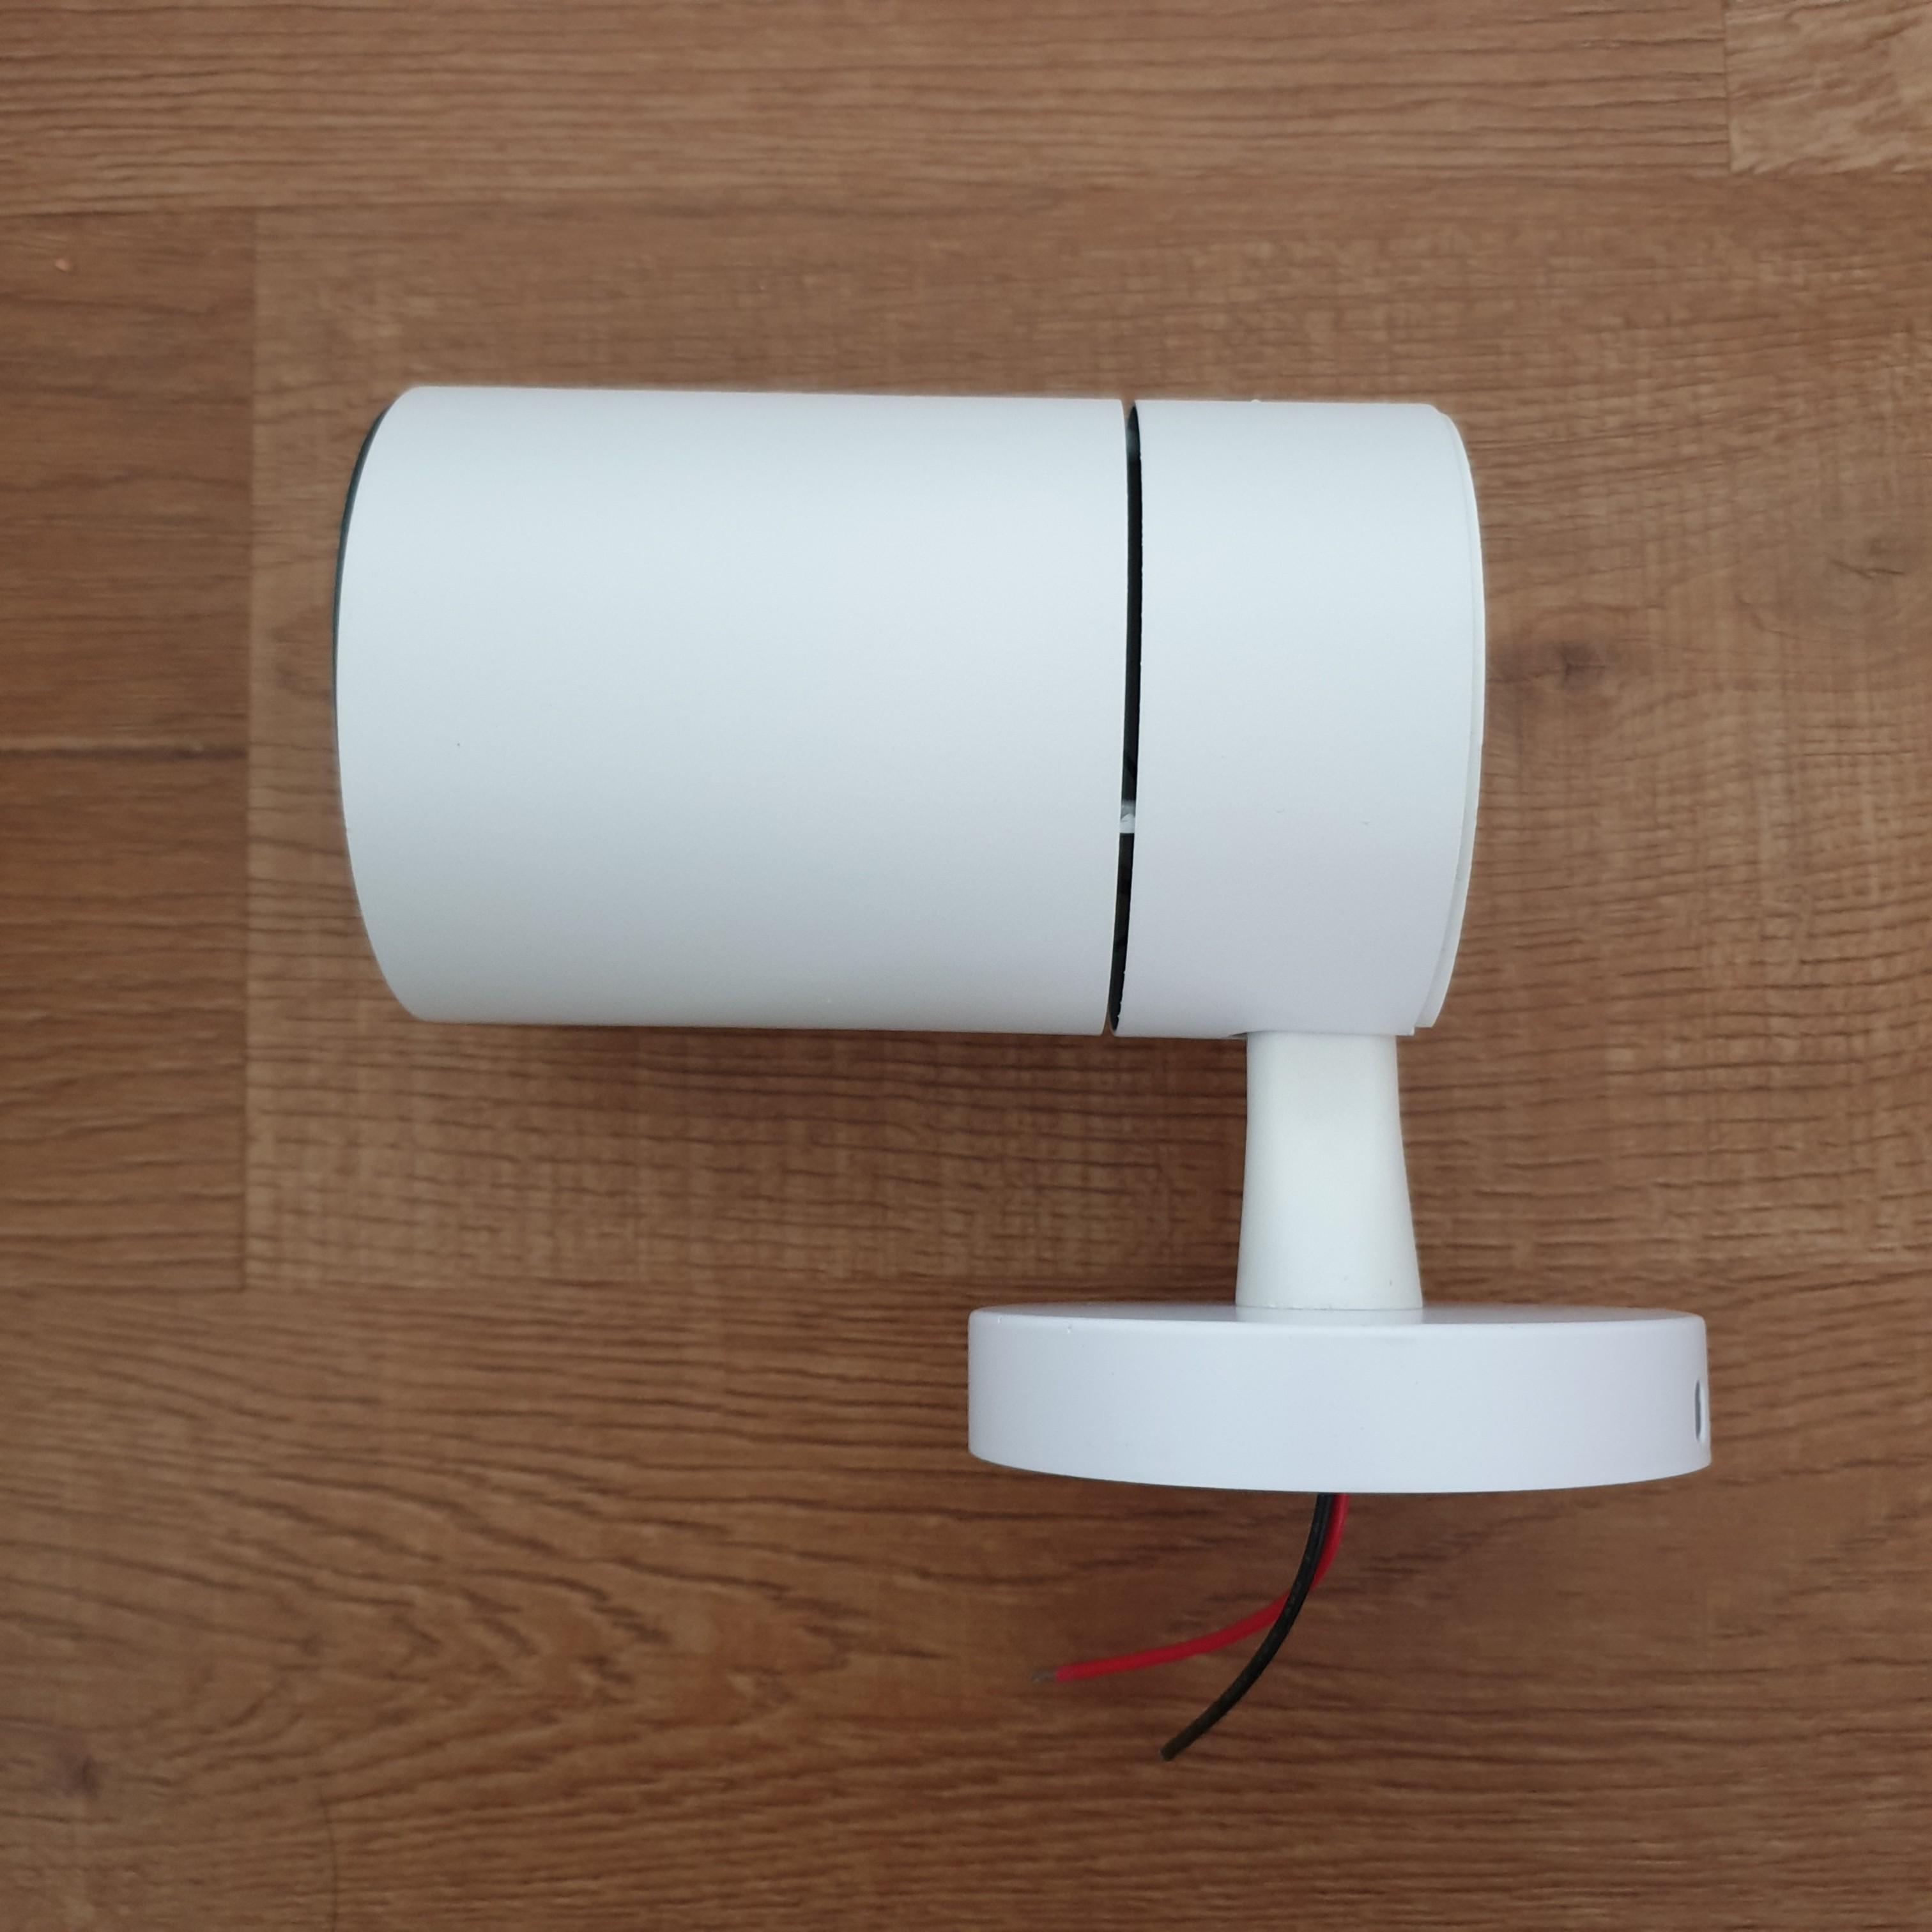 LED Spotlight Ceiling Wall Mount 90° Adjustable Angle